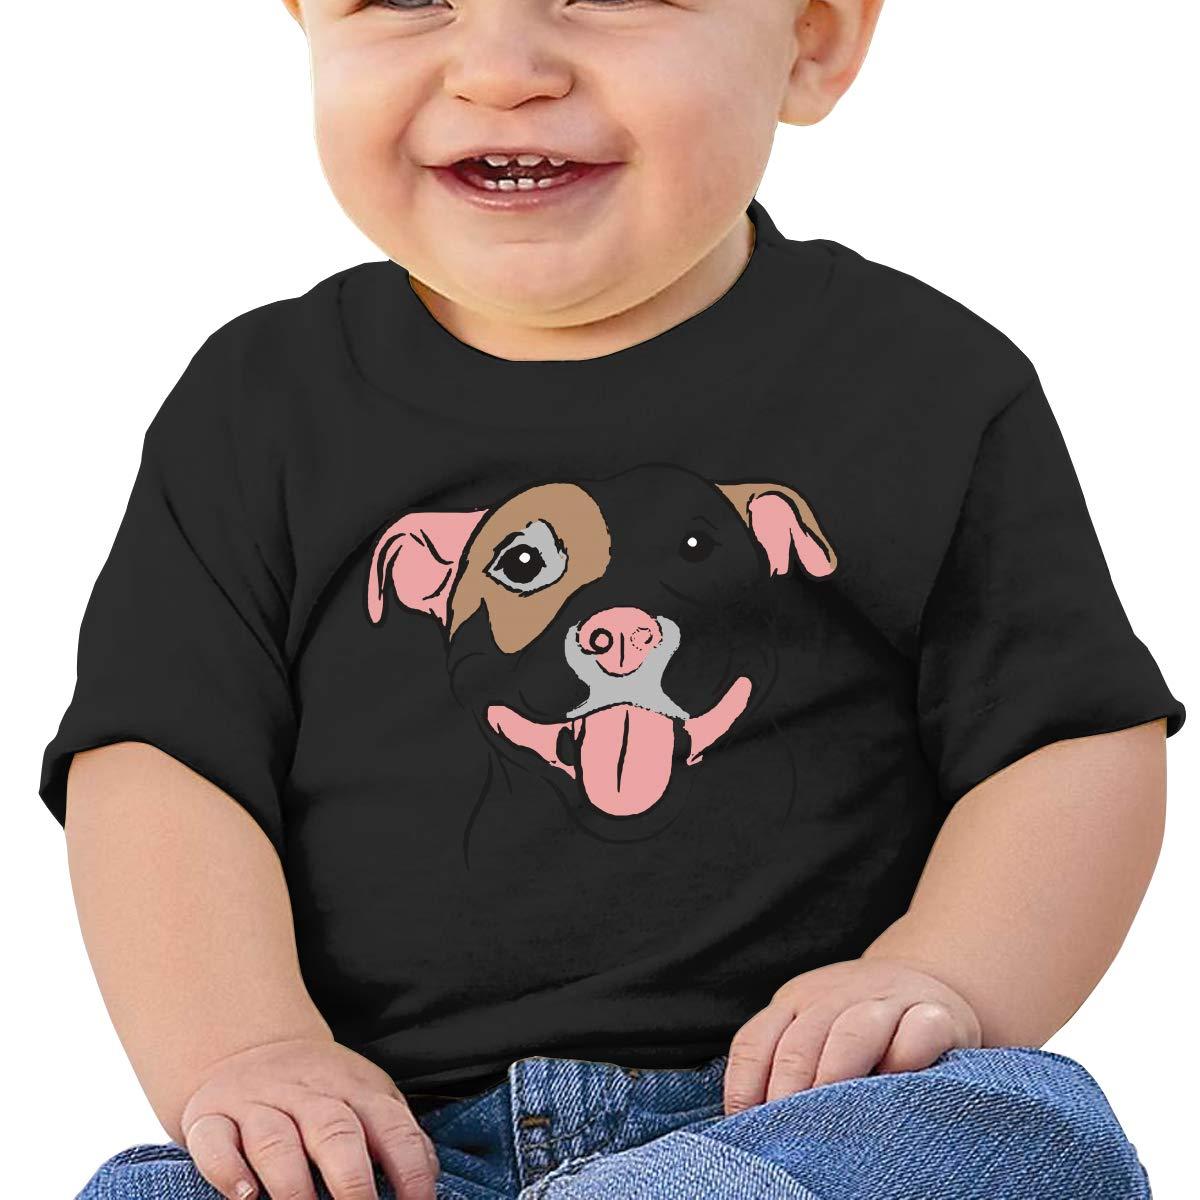 Pit Bull Smile Boy Girl Newborn Short Sleeve T-Shirt 6-24 Month Soft Tops